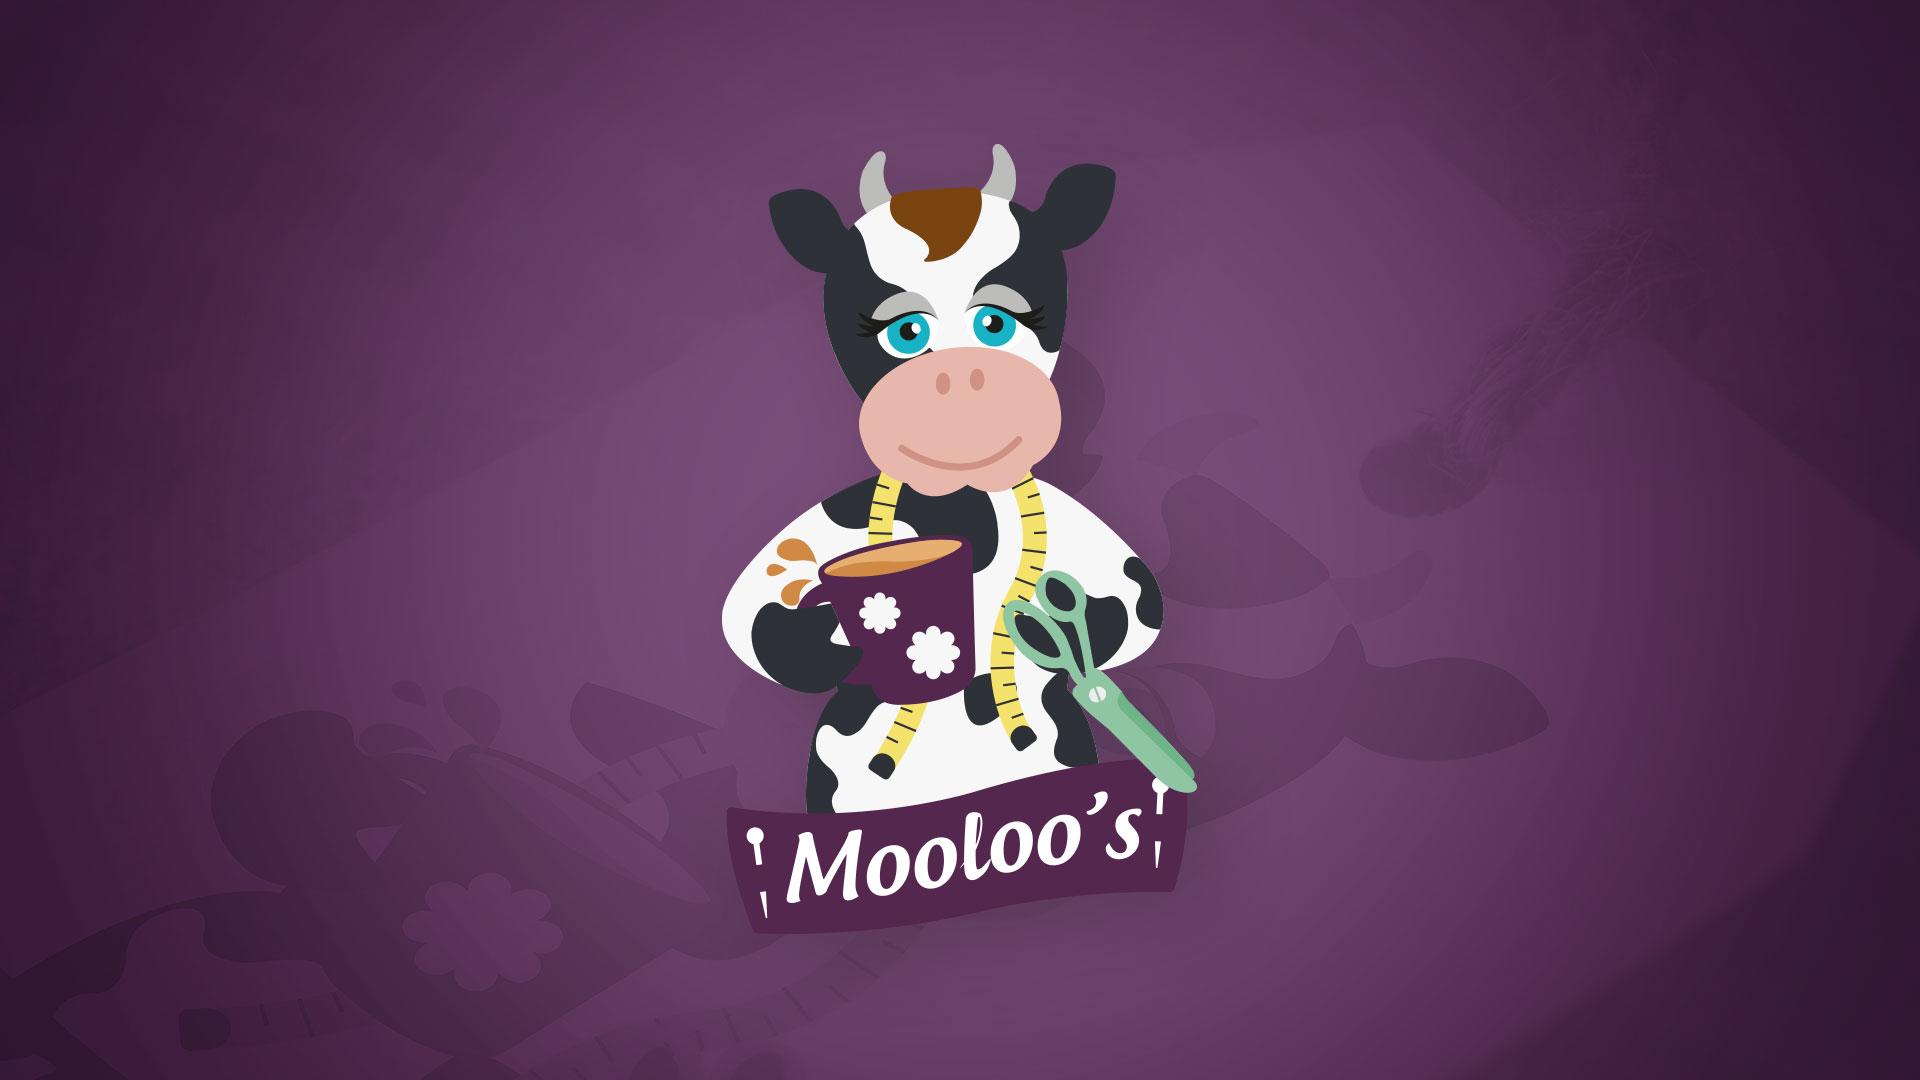 Mooloo's logo